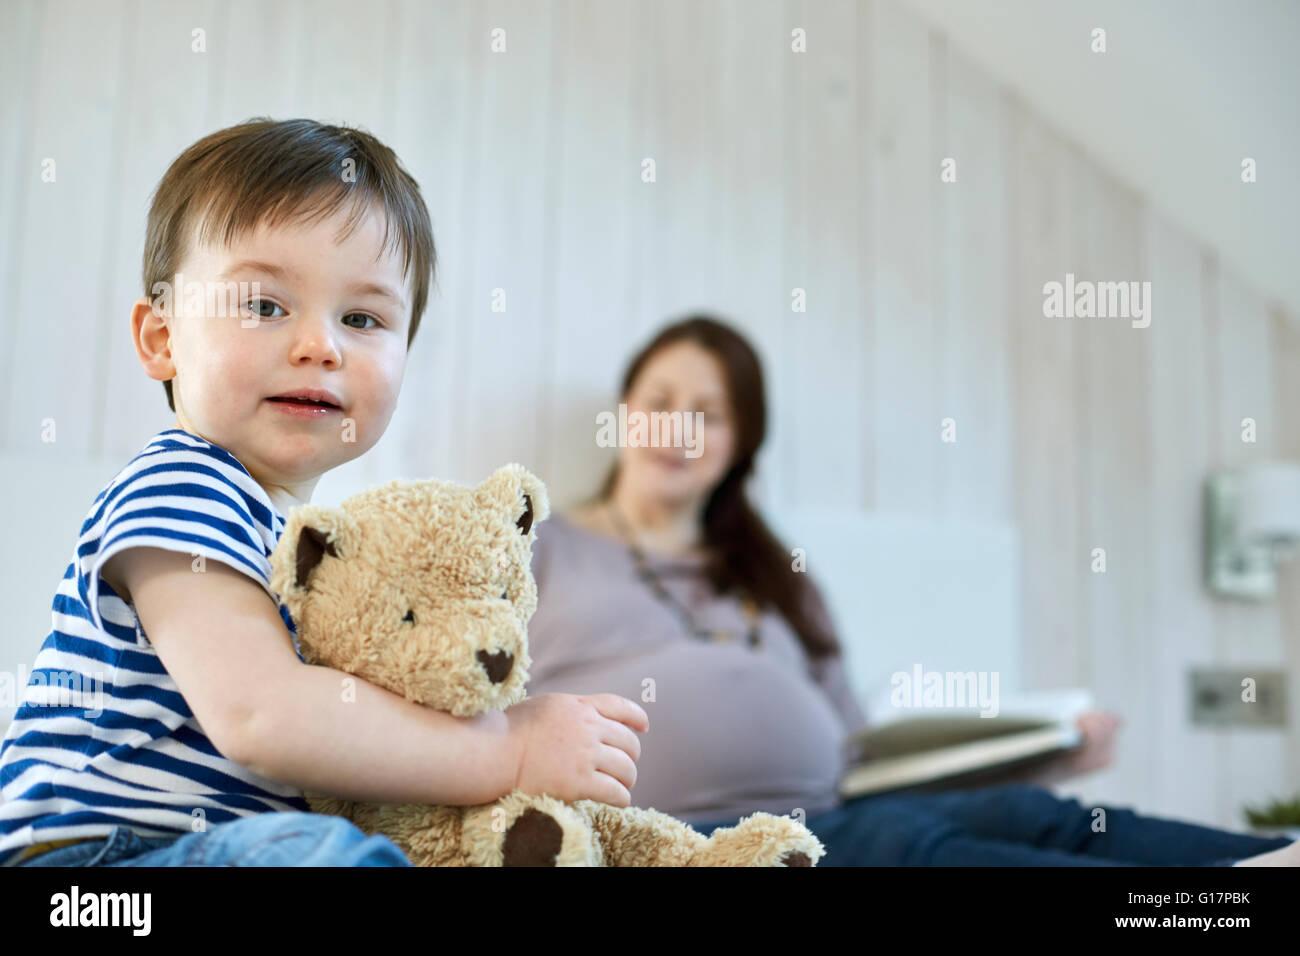 Baby boy holding teddy bear looking at camera - Stock Image